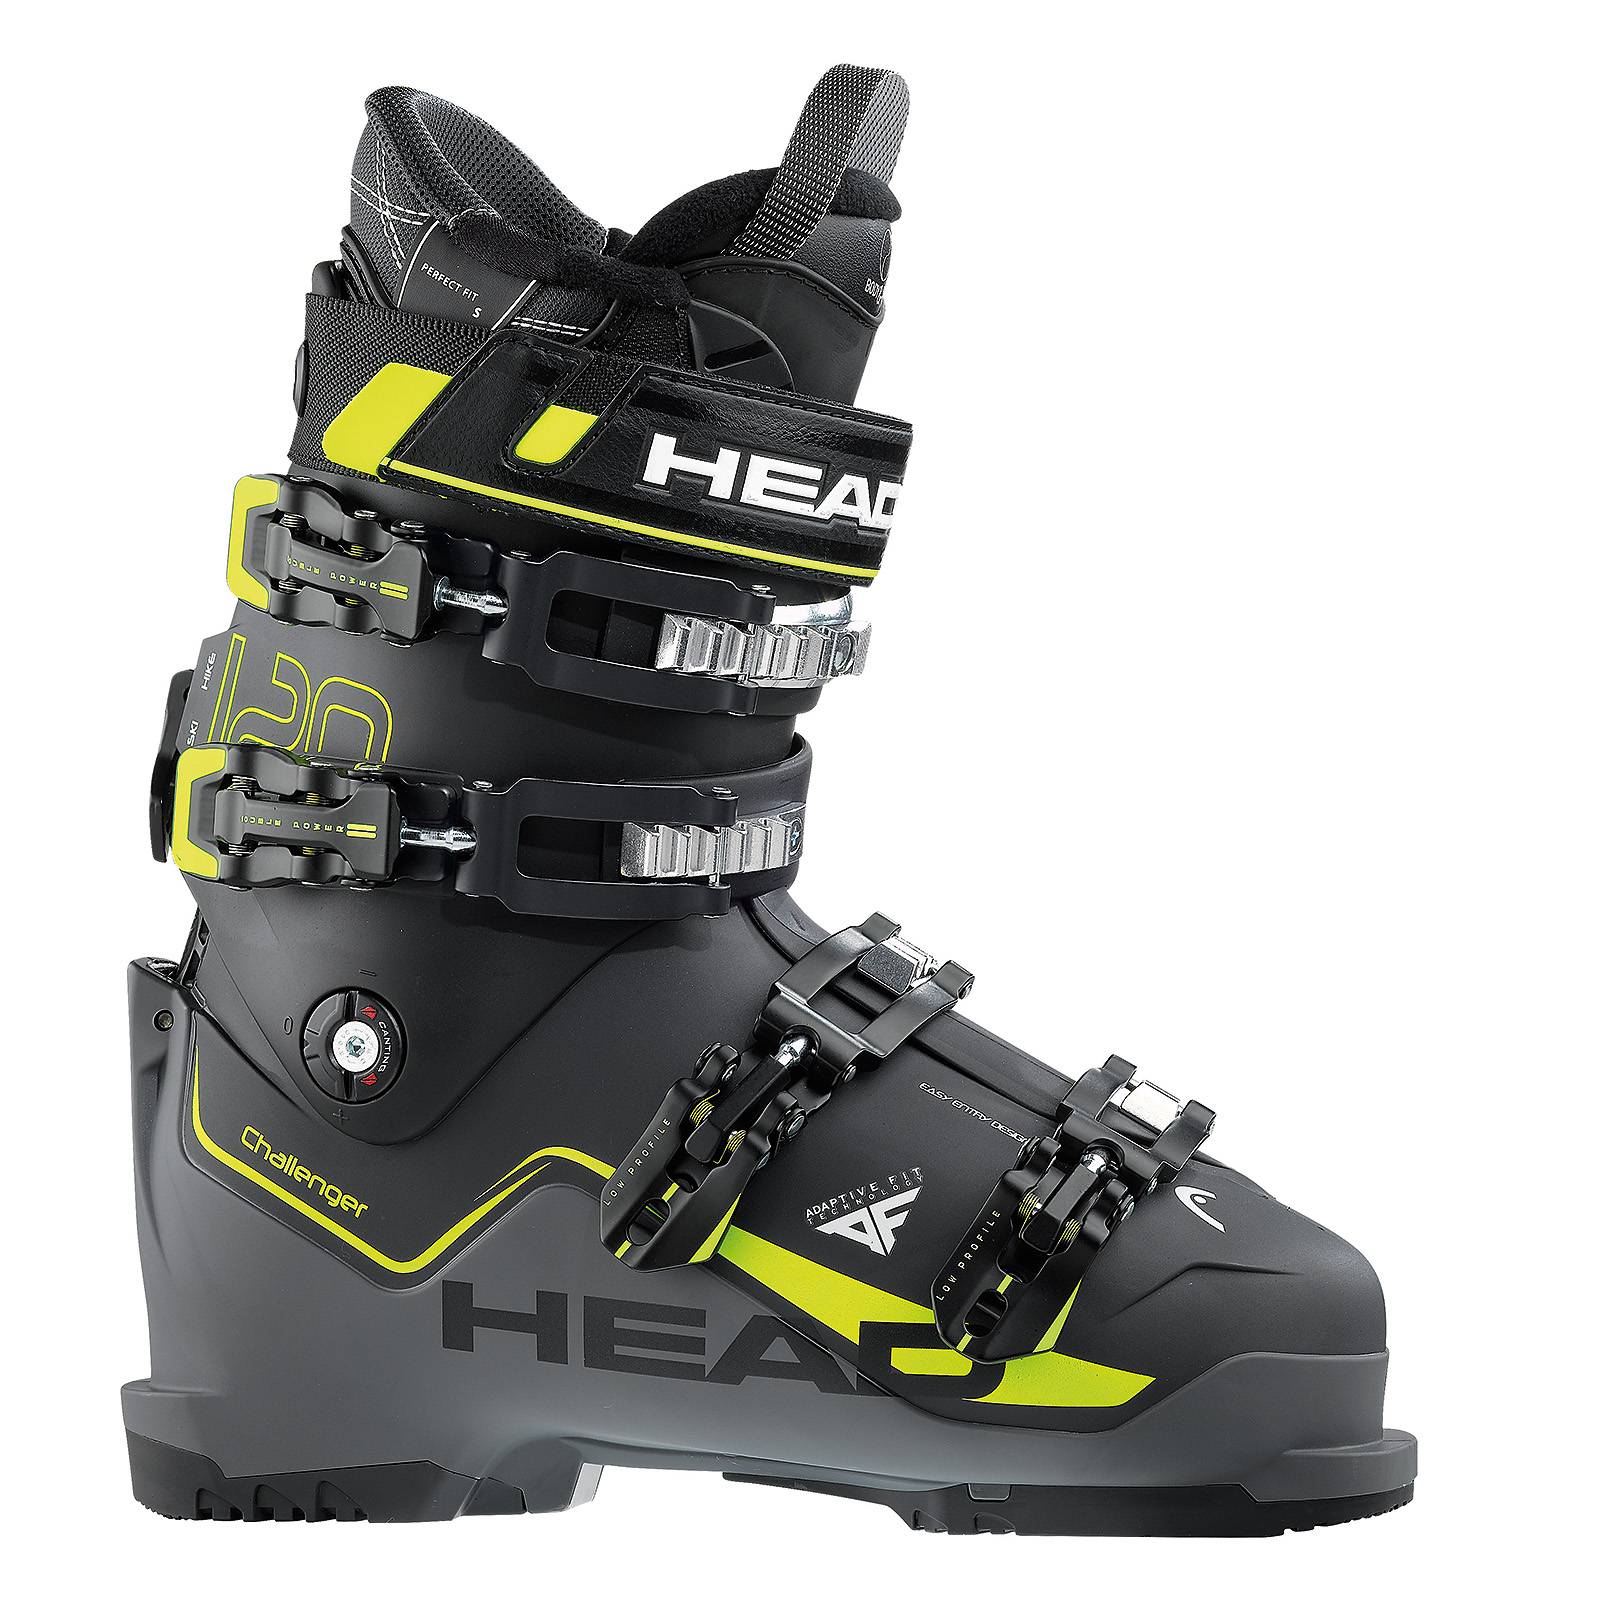 8ba84dde1e 2017-18 Salomon QST Pro 130 TR Mens Ski Boot - Anything Technical